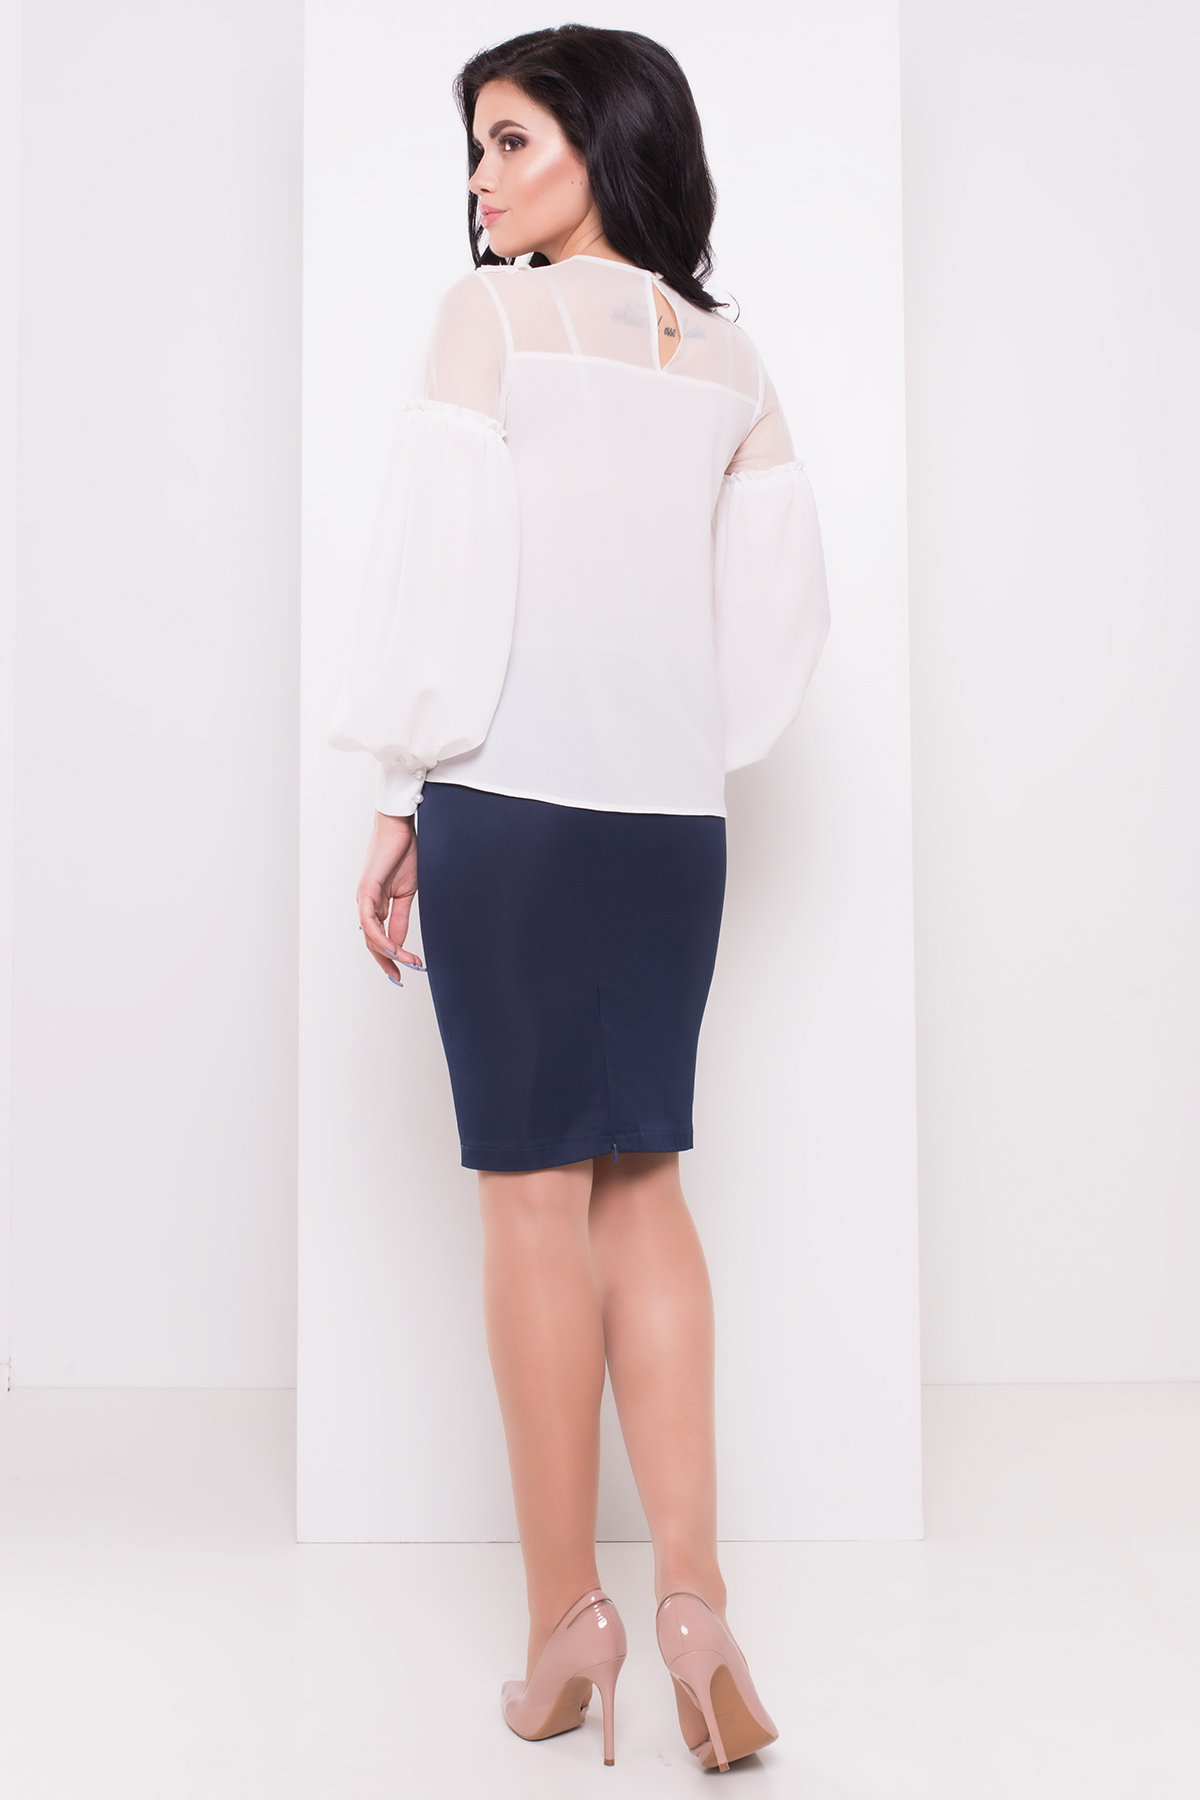 Шифоновая блузка Асия 3230 Цвет: Белый